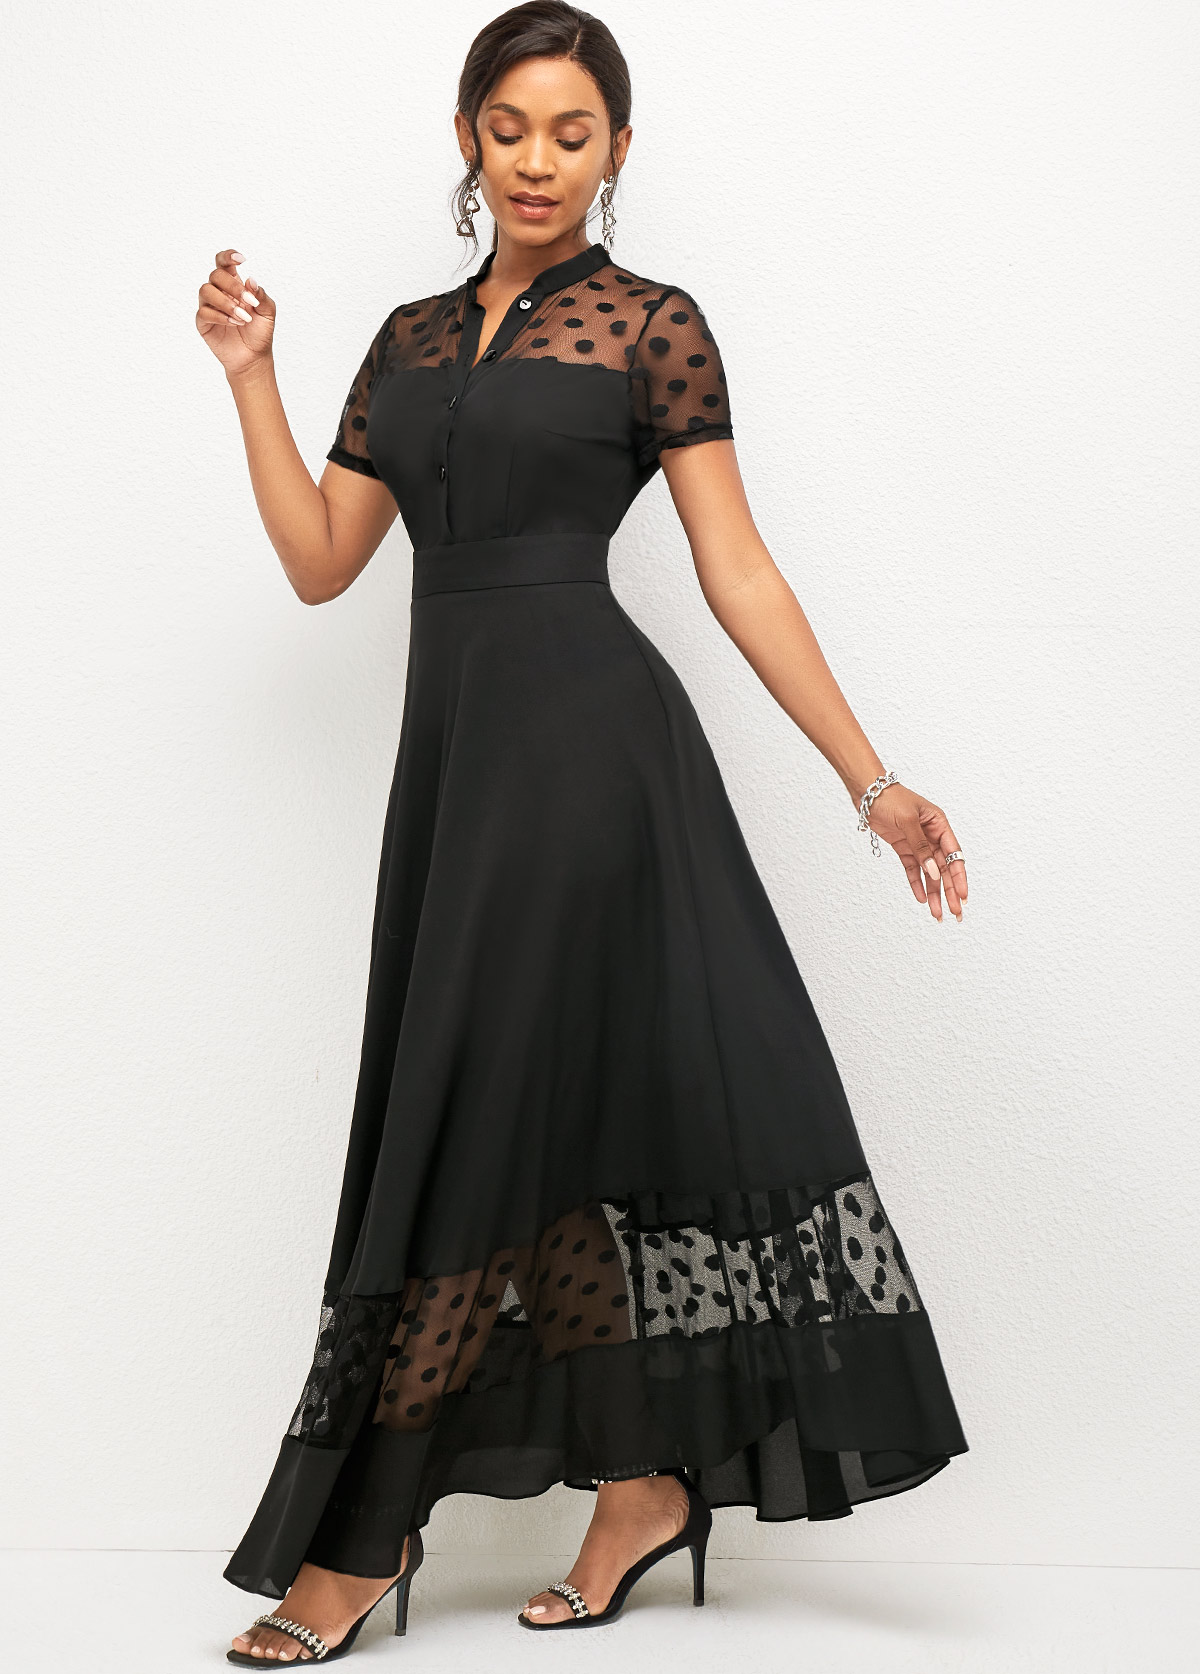 Mesh Stitching Short Sleeve Polka Dot Dress